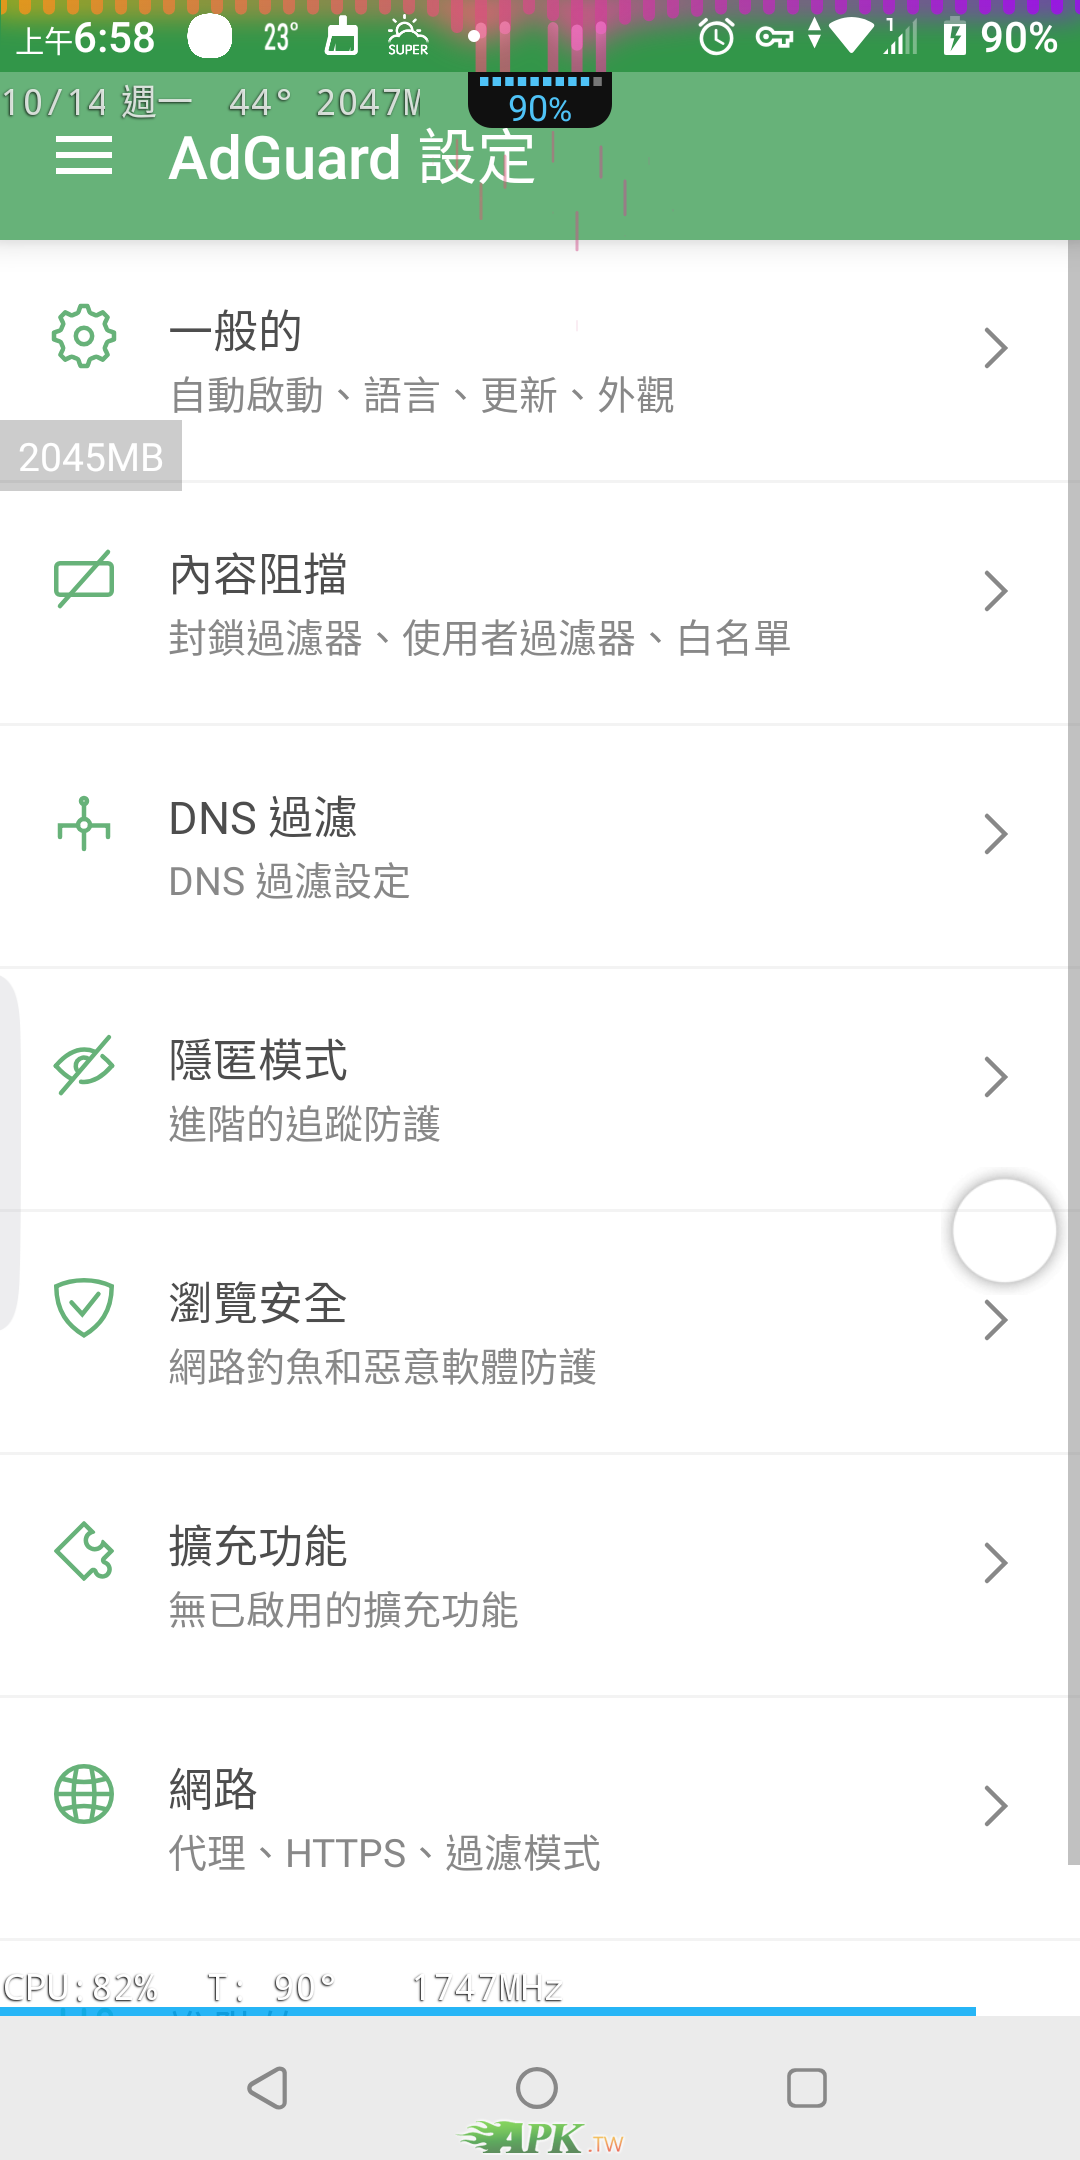 Screenshot_20191014-065819.png